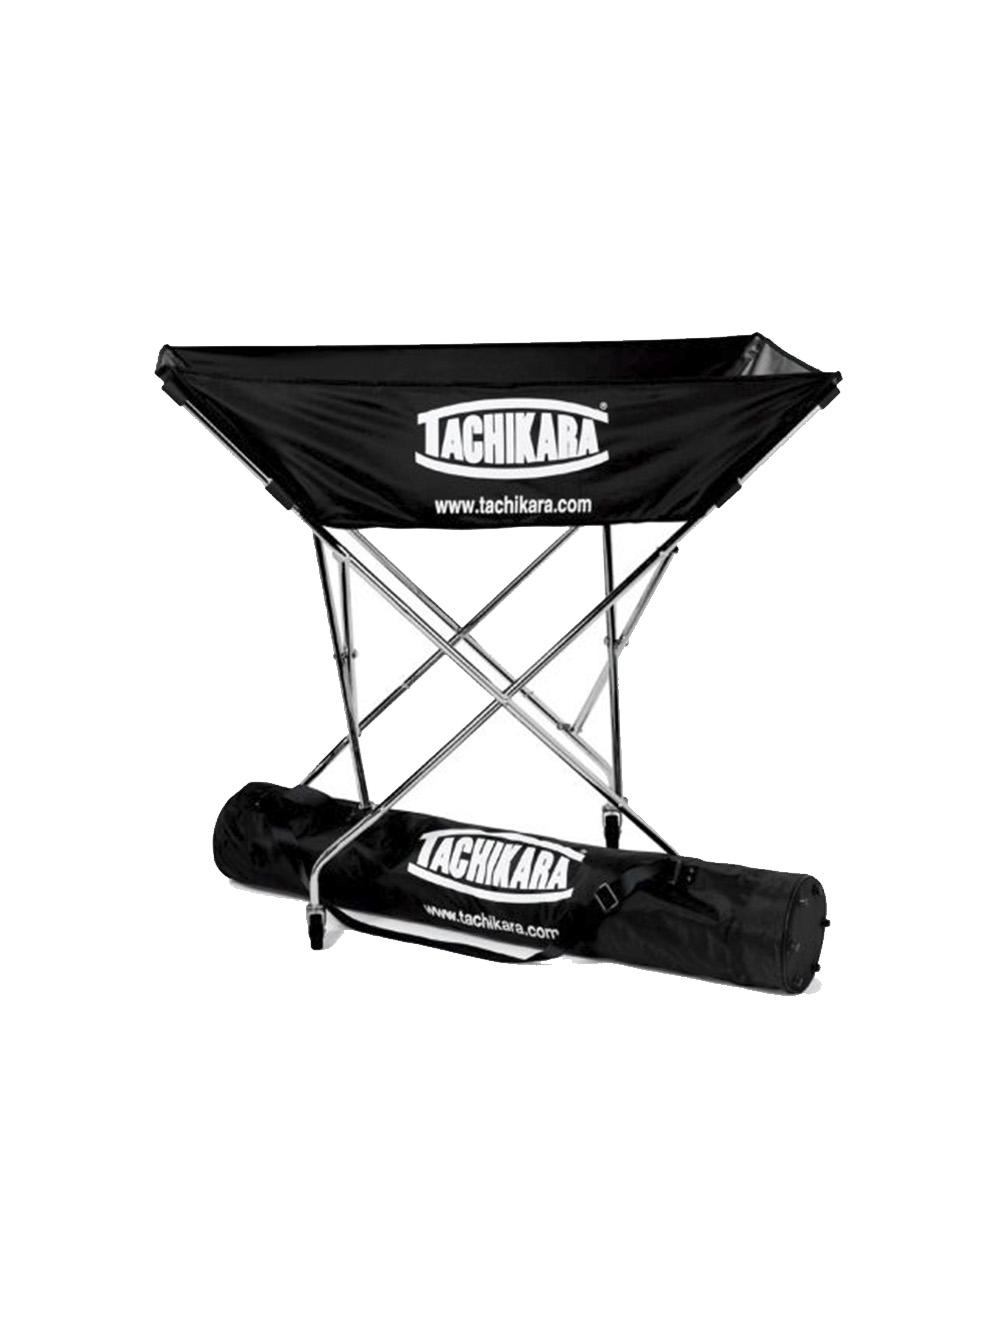 Tachikara Collapsible Hammock Ball Cart Midwest Volleyball Warehouse